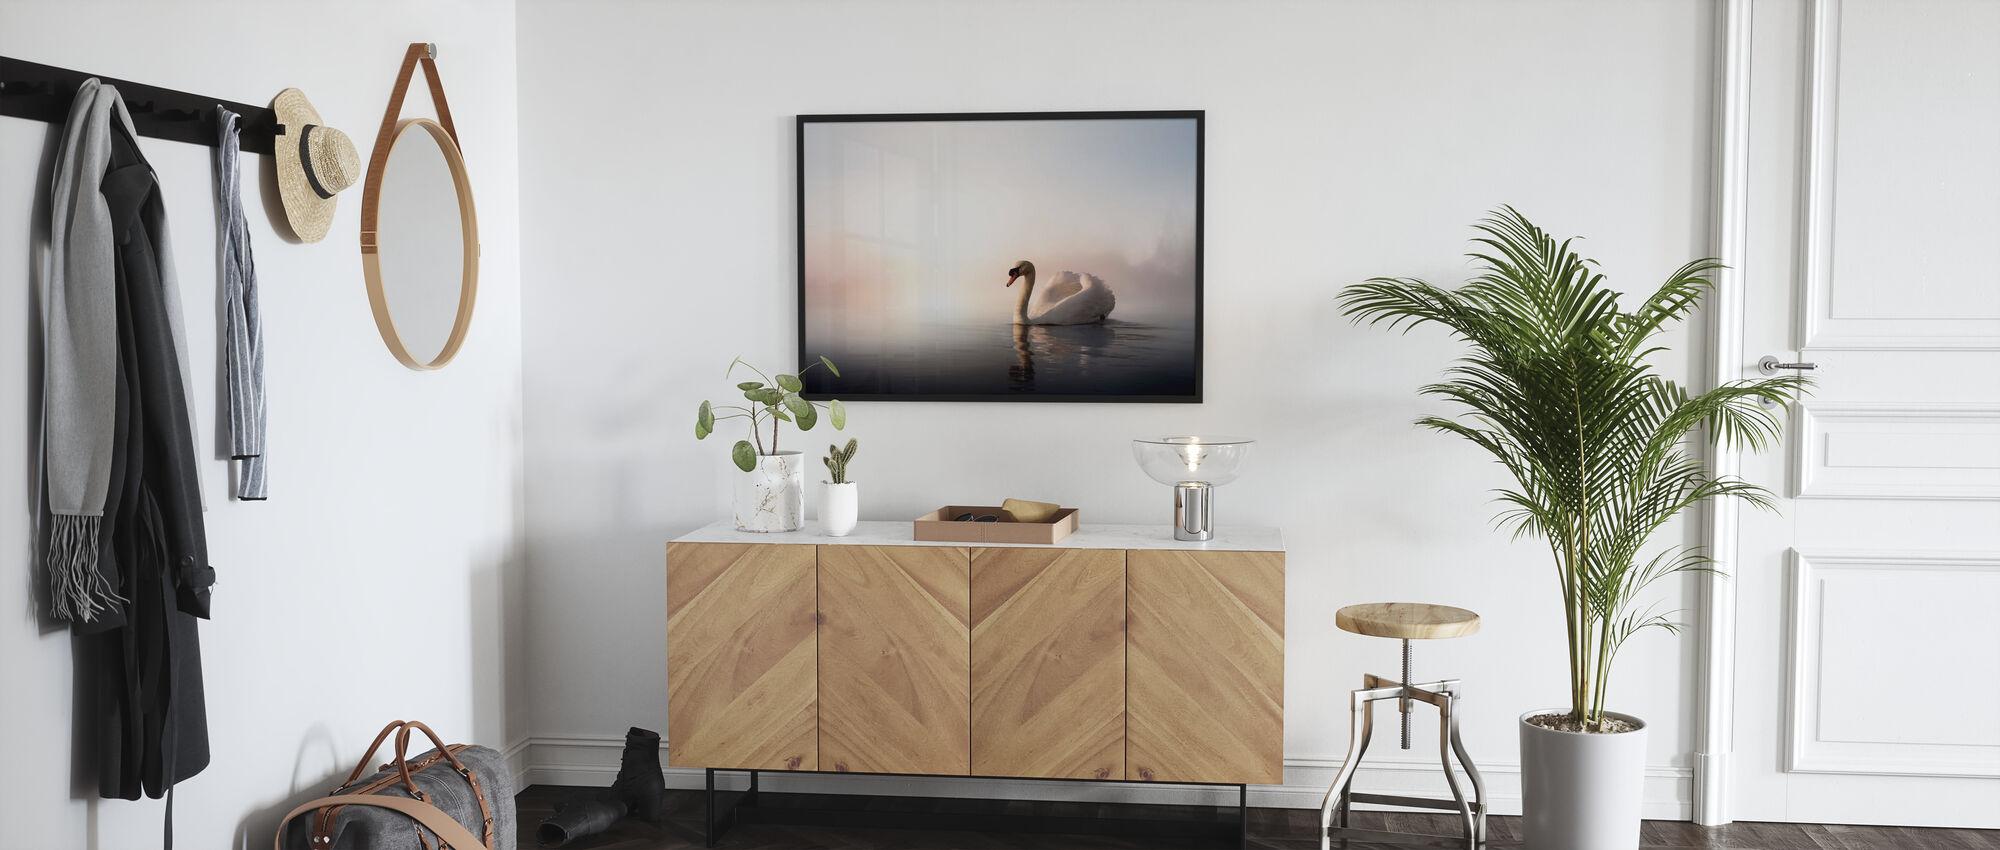 Swan Floating - Poster - Hallway